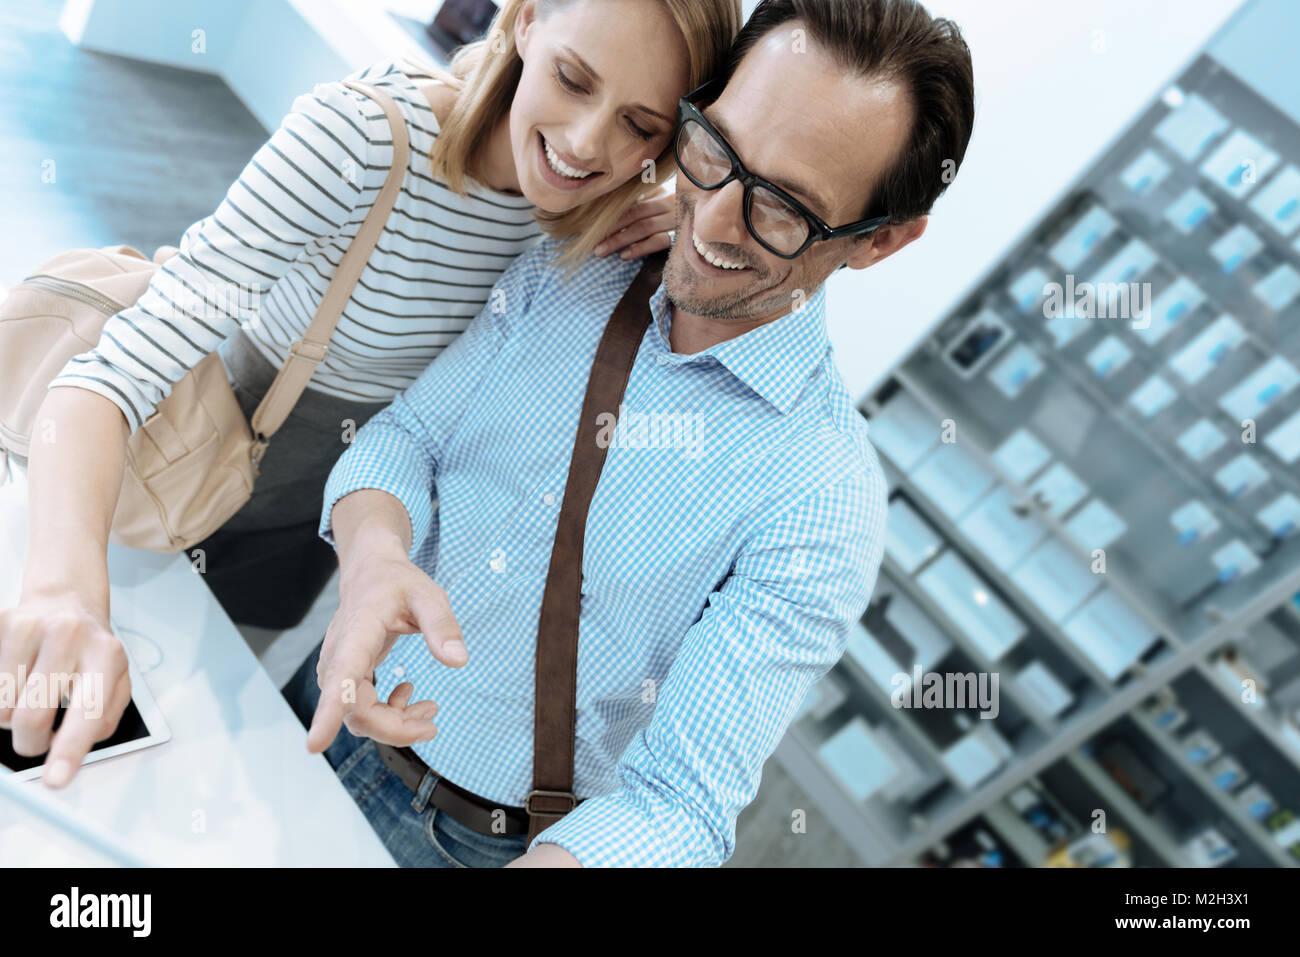 Loving couple choosing telephone together - Stock Image